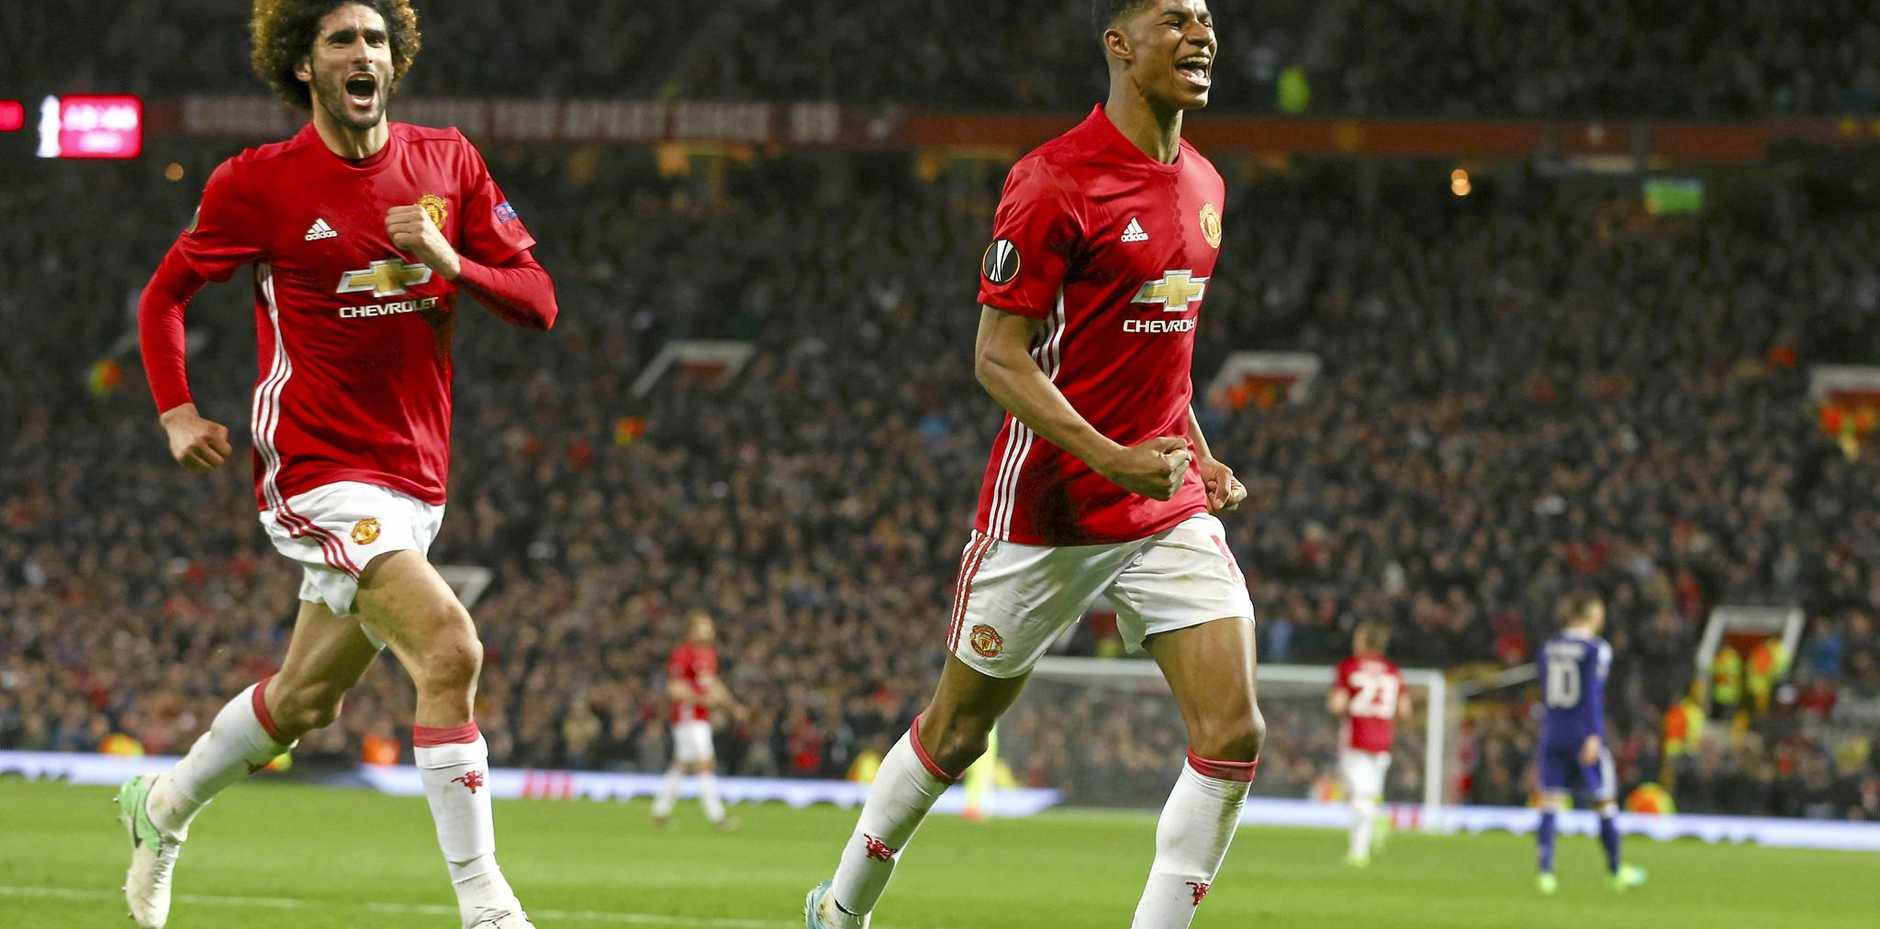 Manchester United's Marcus Rashford (right), with teammate Marouane Fellaini, celebrates his side's winner.